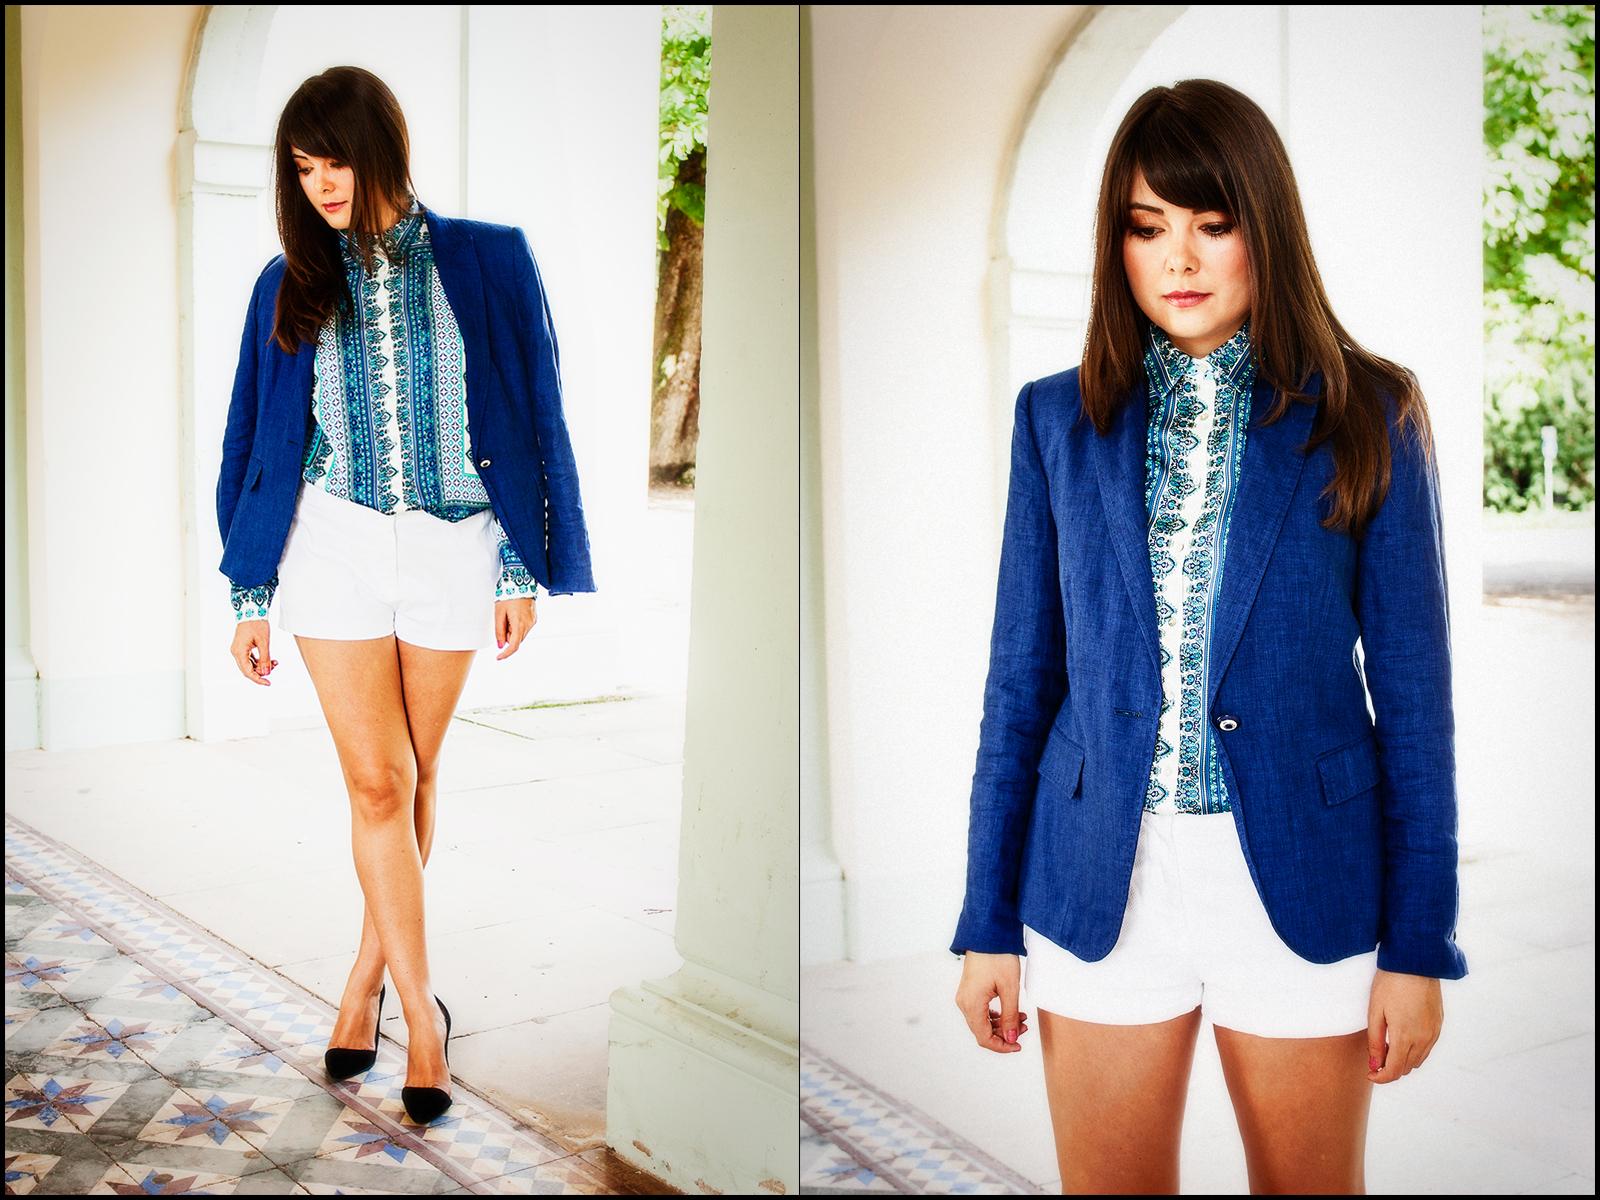 fashionambit-fashionblog-muenchen-styleblog-munich-blogger-deutschland-fashionblogger-bloggerdeutschland-style-blog-lifestyle-blog-modeblog-united-nation-blazer-blau-